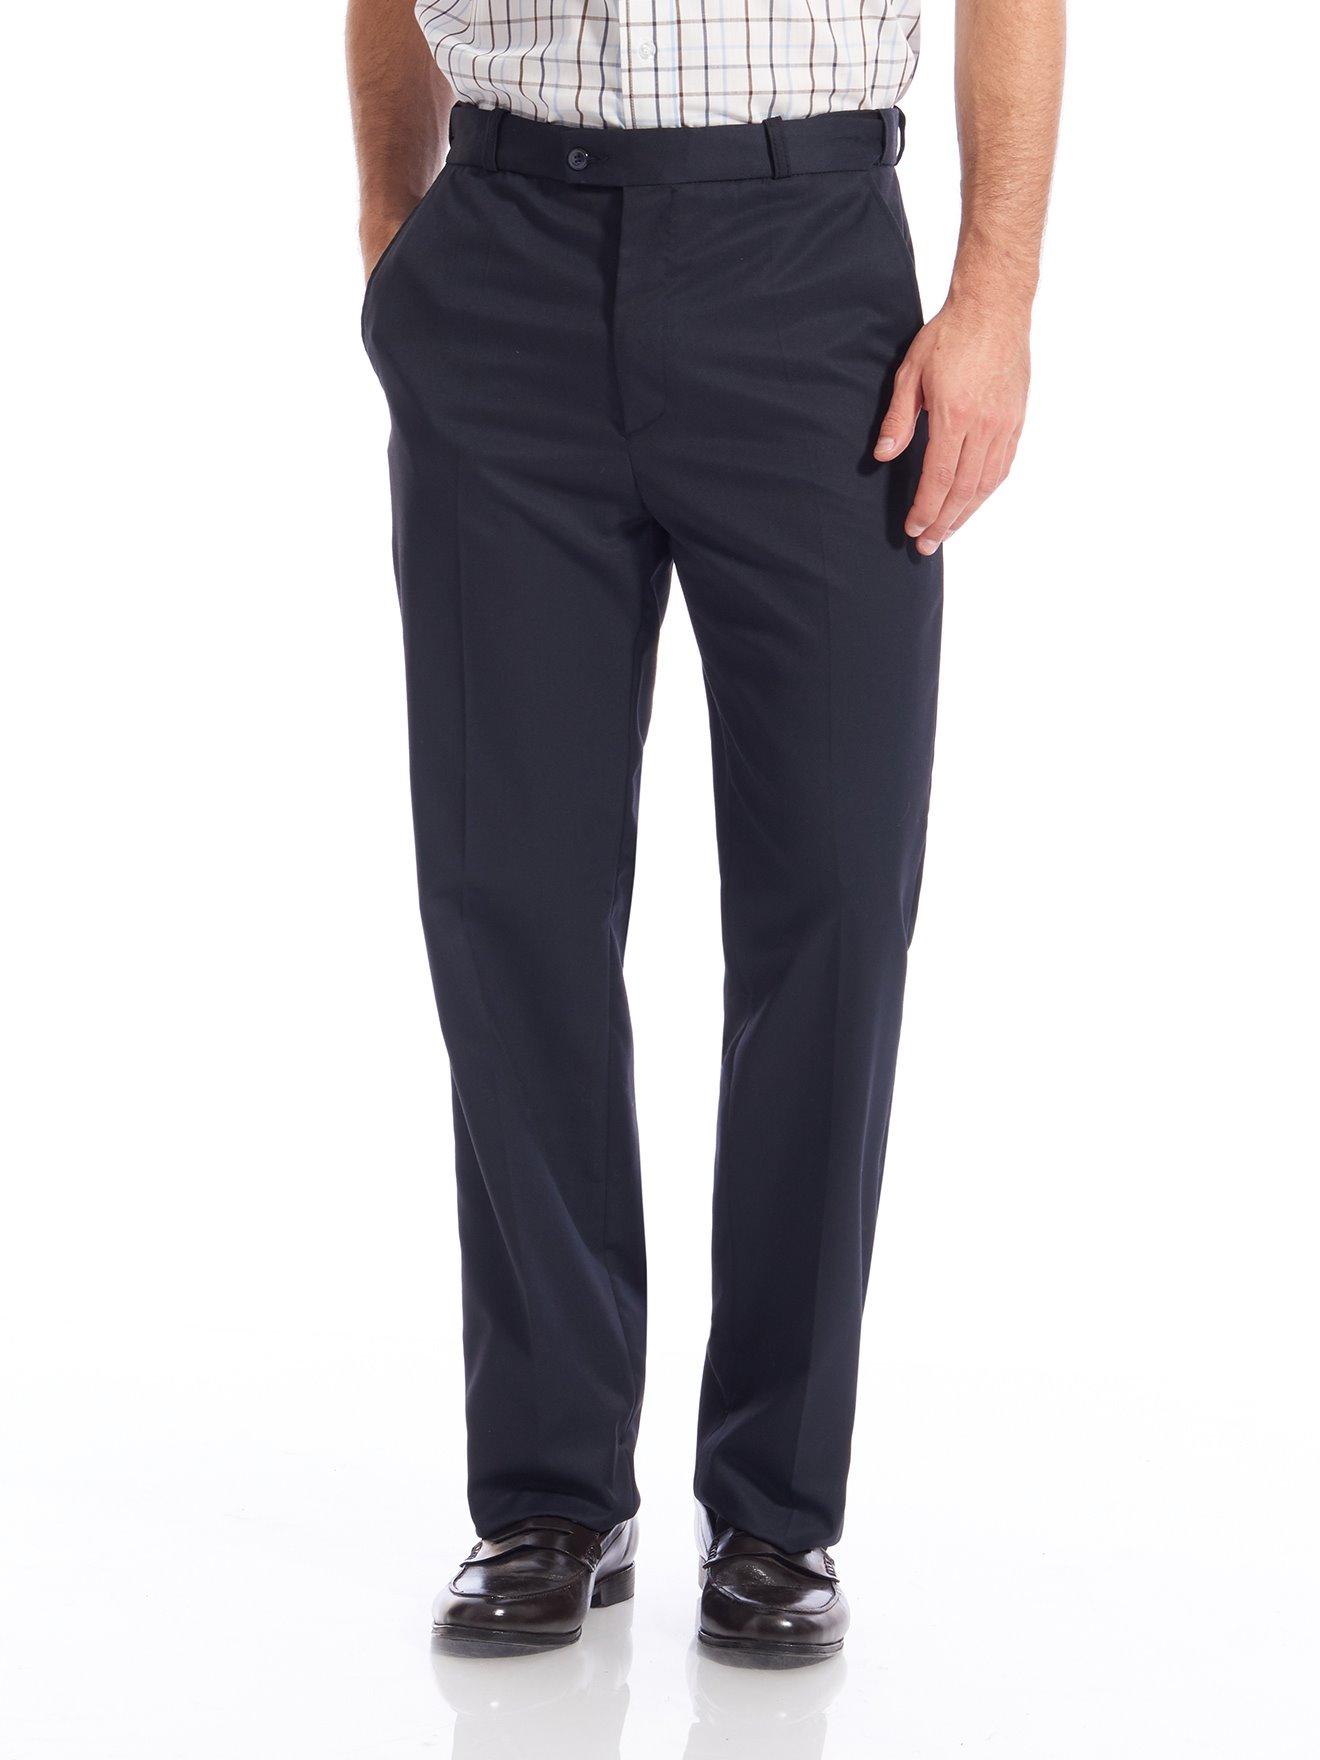 pantalon ceinture r glable invisible daxon. Black Bedroom Furniture Sets. Home Design Ideas